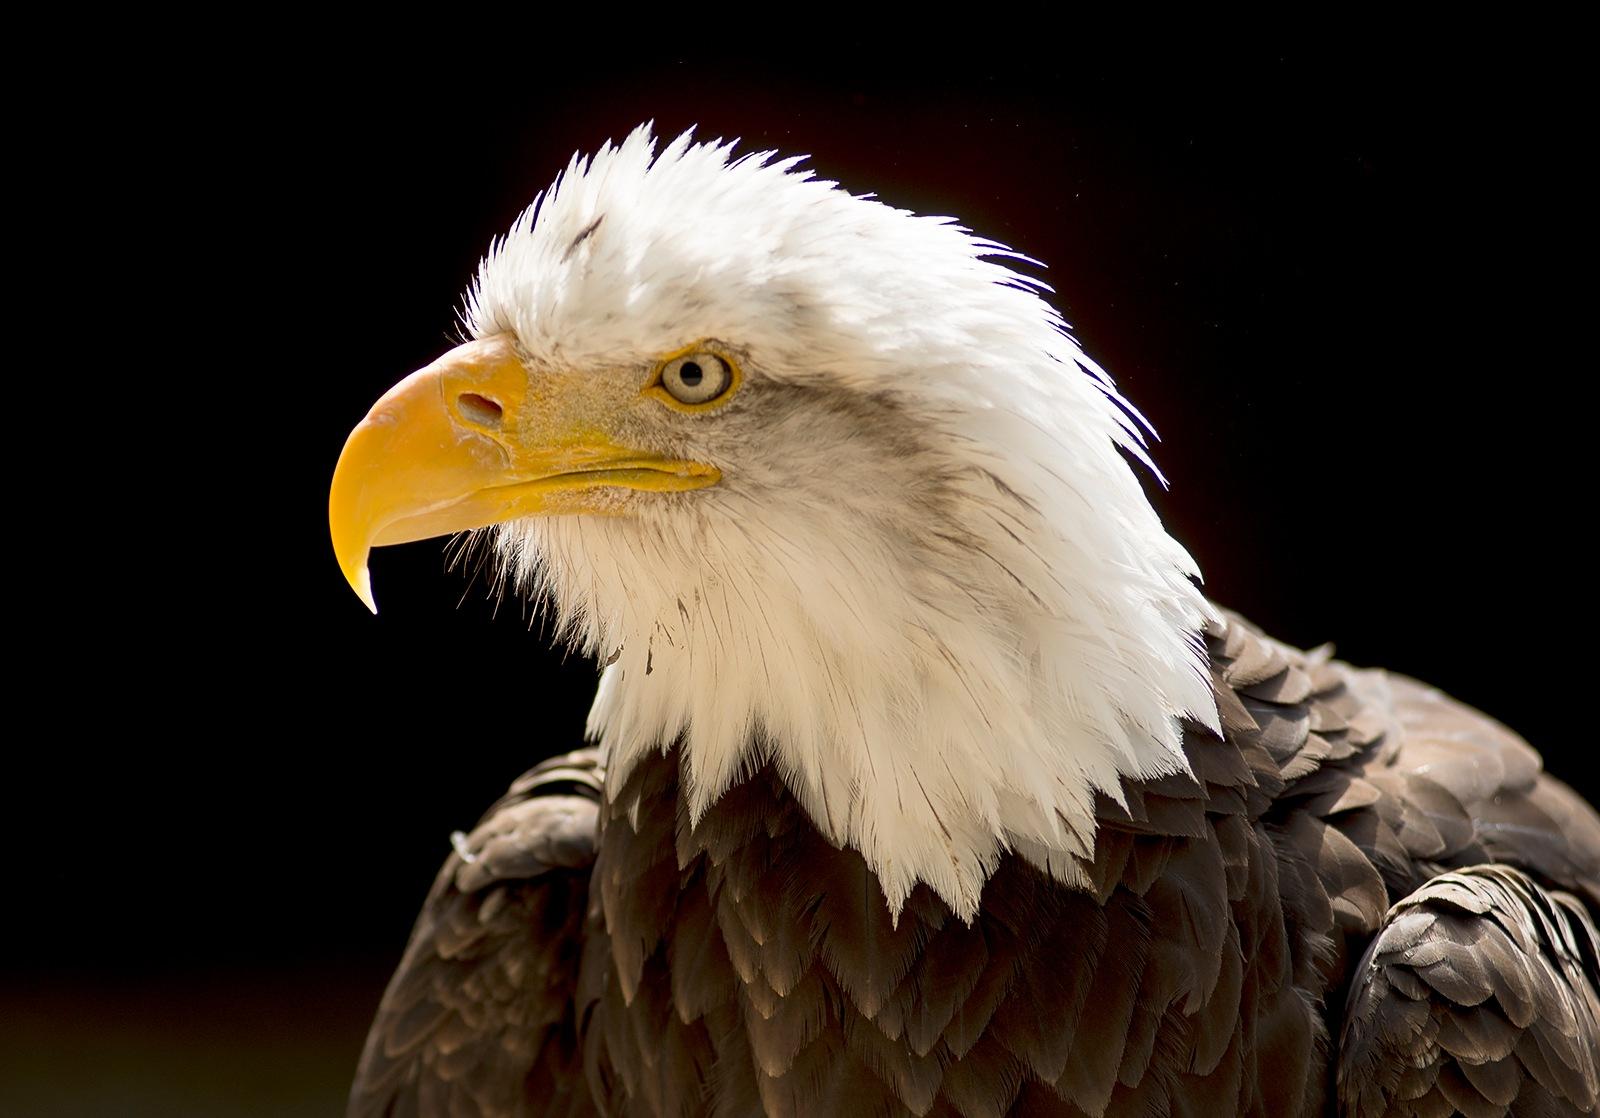 Bald Eagle by miloslaw.spiewak